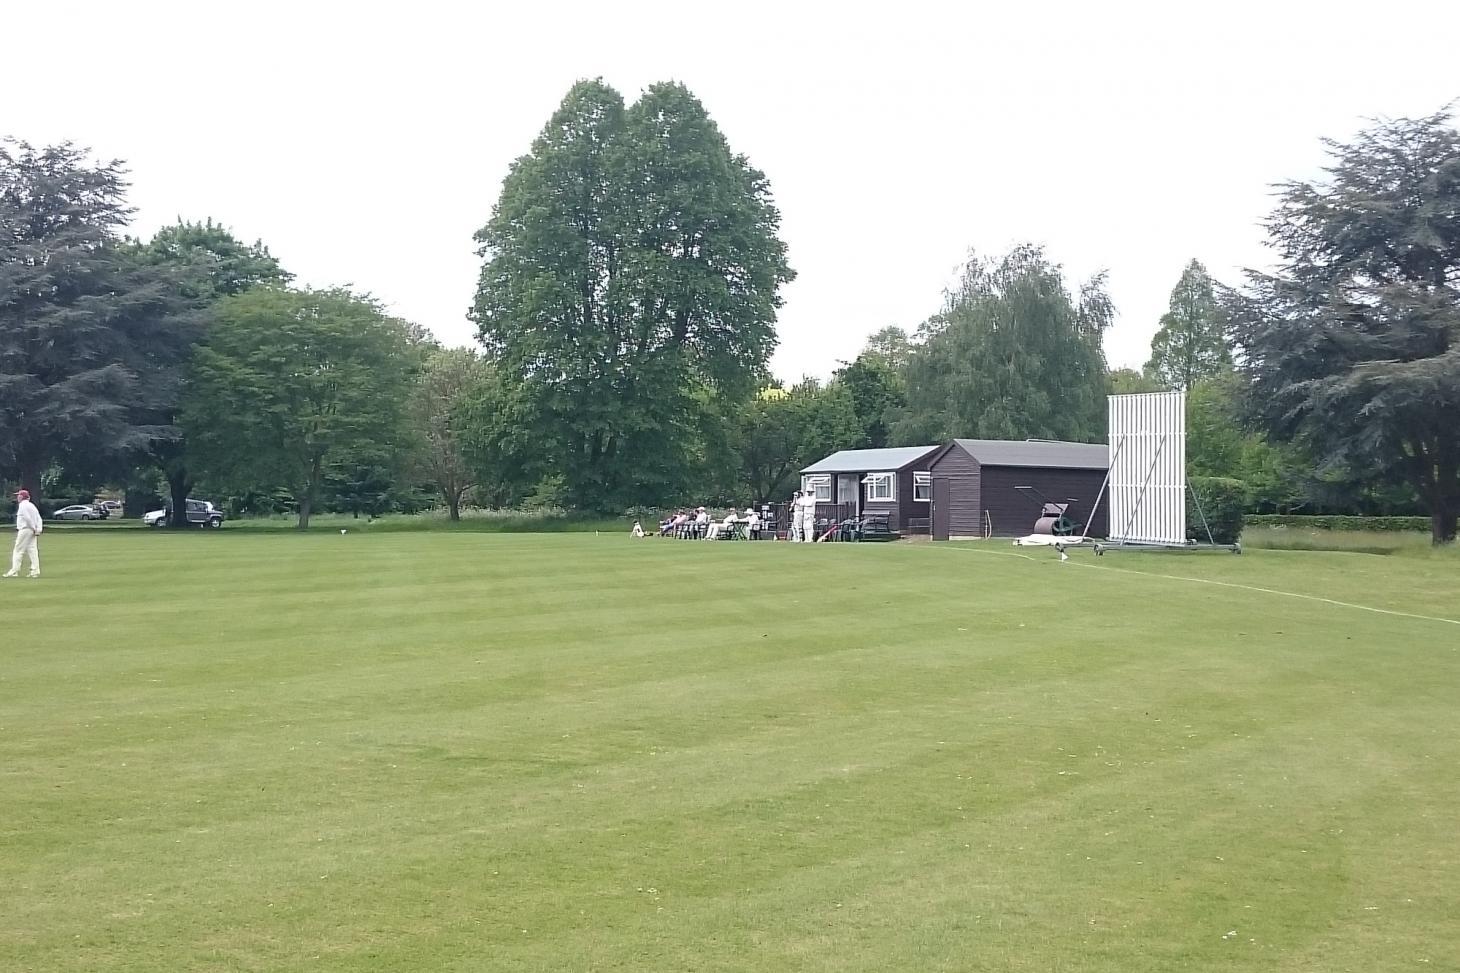 Odney Cricket Club Full size | Grass cricket facilities